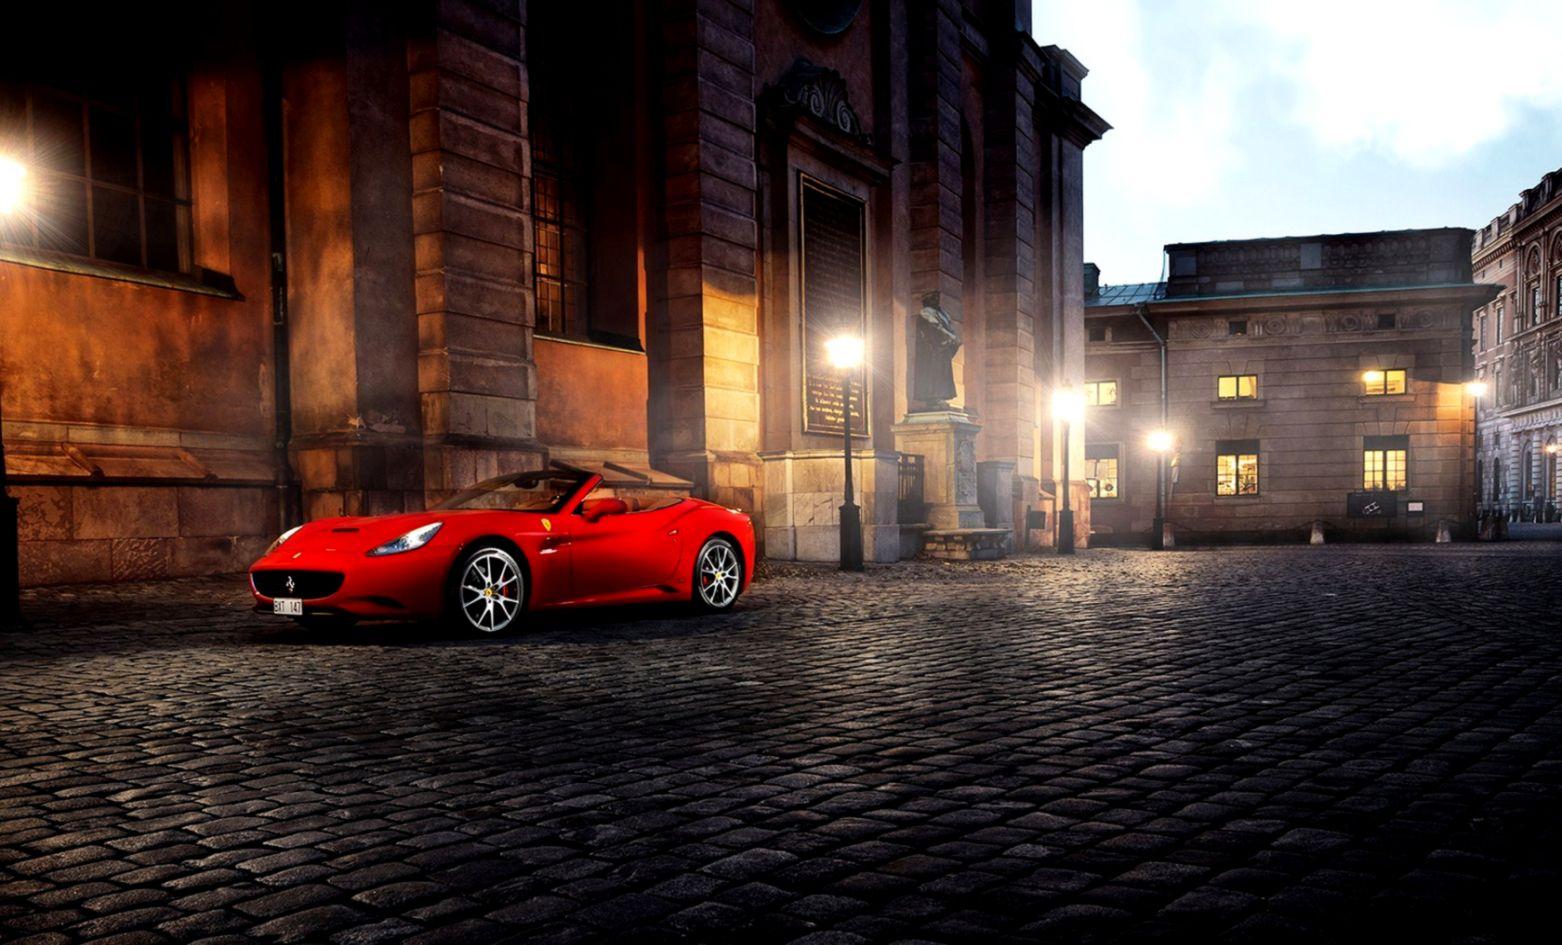 Ferrari California Red Car Parking Hd Wallpaper Free HD Wallpapers